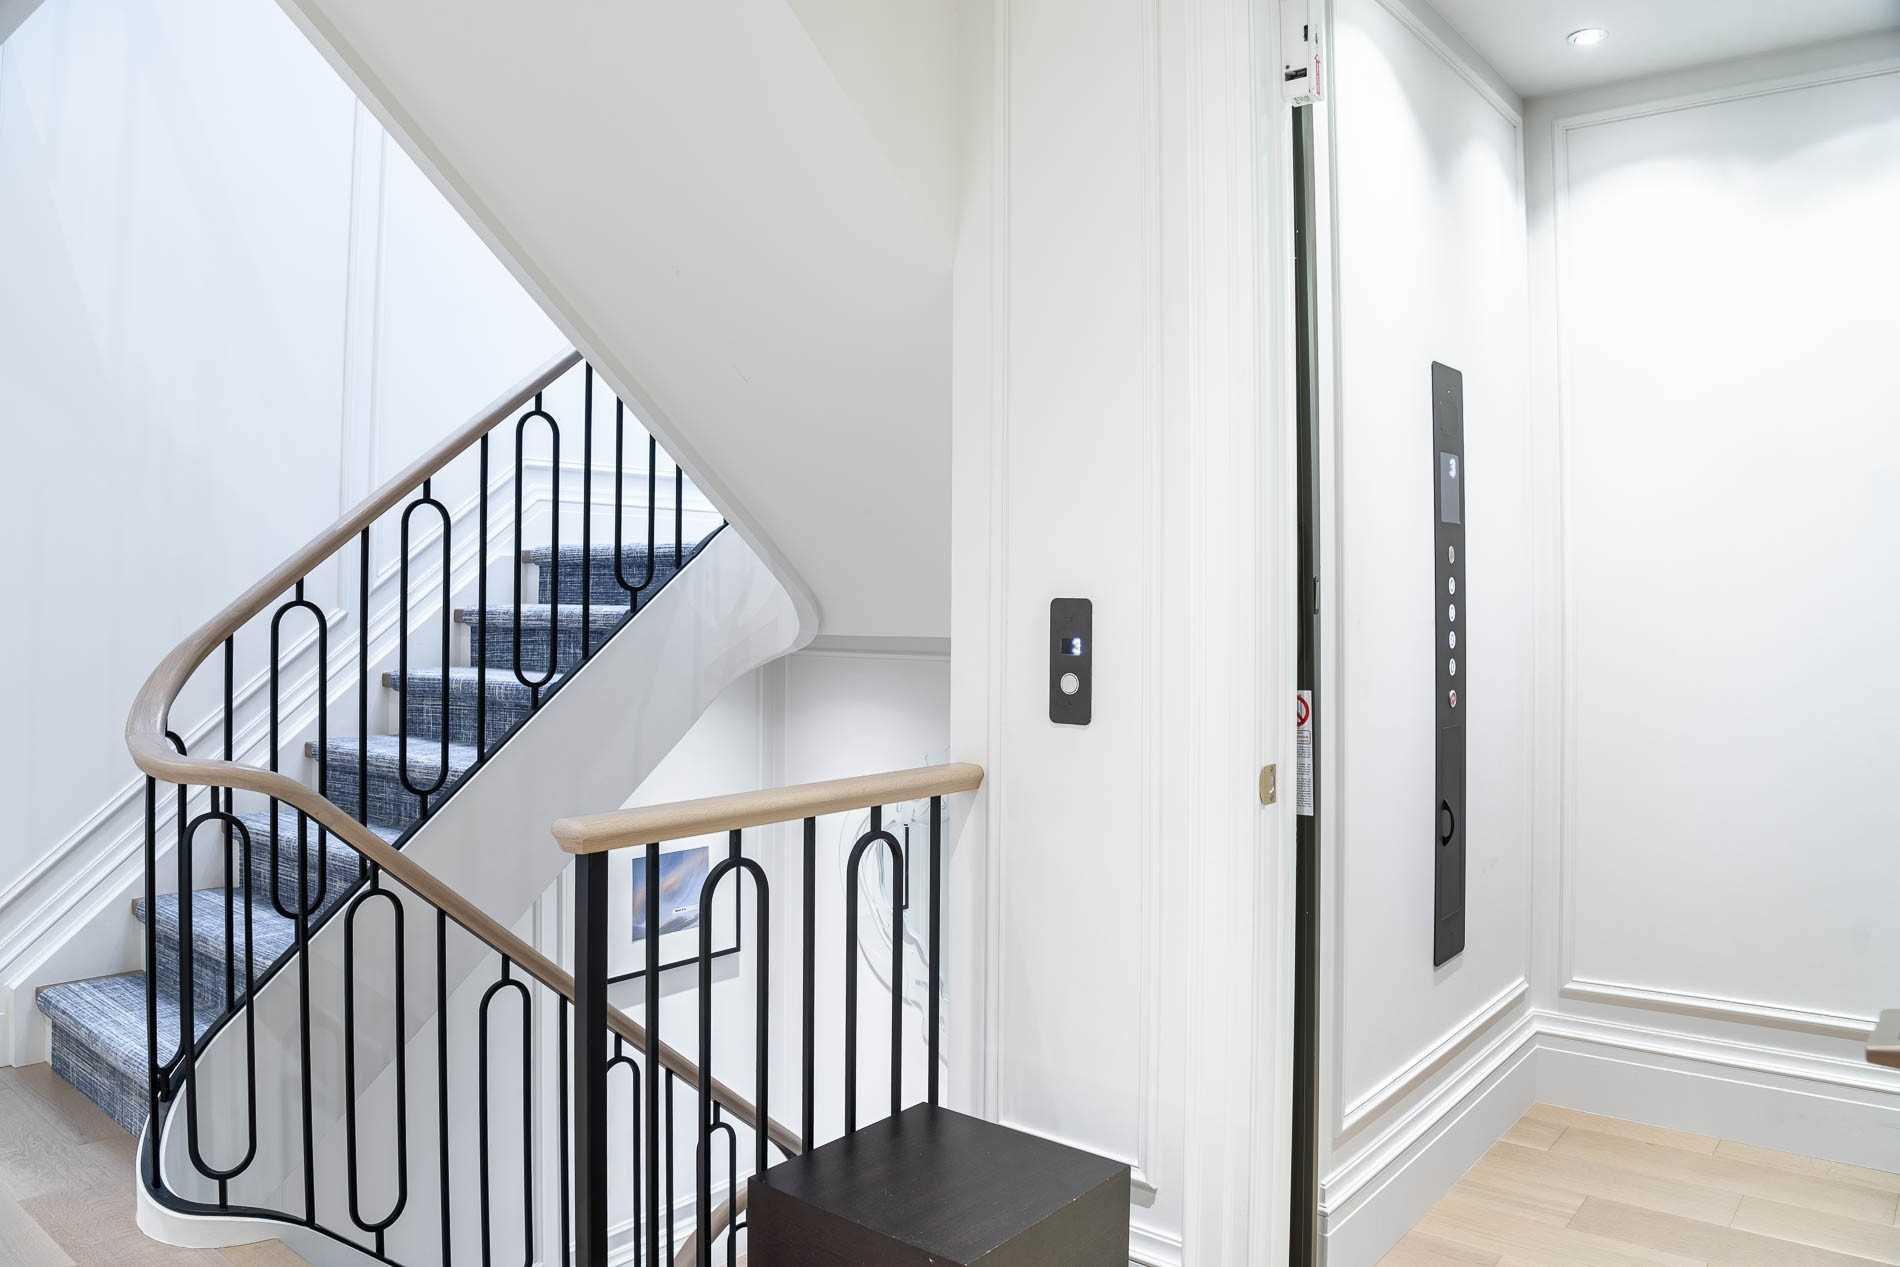 Photo 11: Photos: 45 Admiral Road in Toronto: Annex House (3-Storey) for sale (Toronto C02)  : MLS®# C4612730